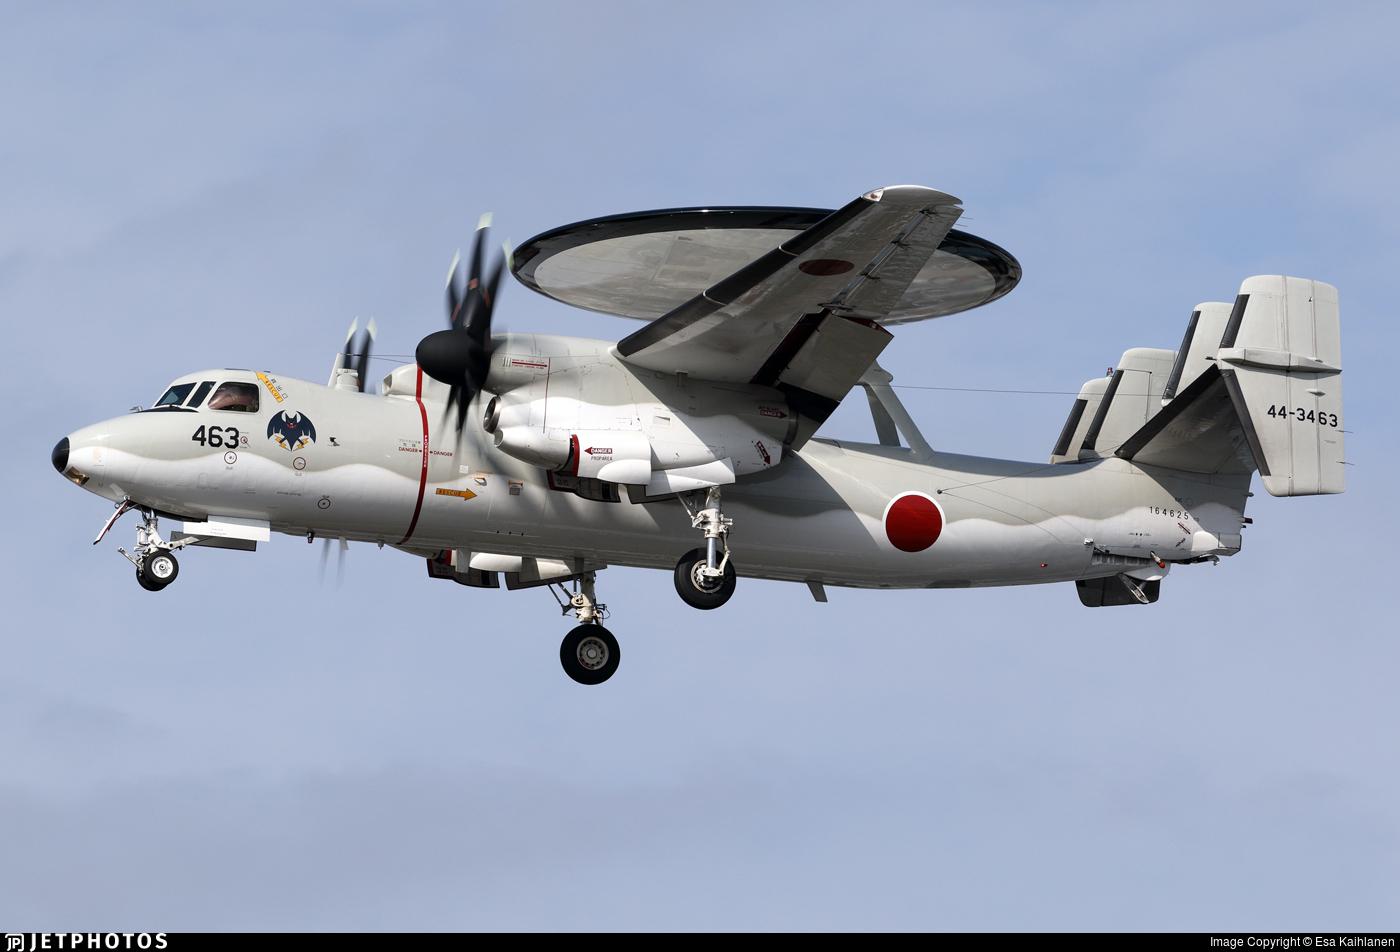 44-3463 - Grumman E-2C Hawkeye - Japan - Air Self Defence Force (JASDF)